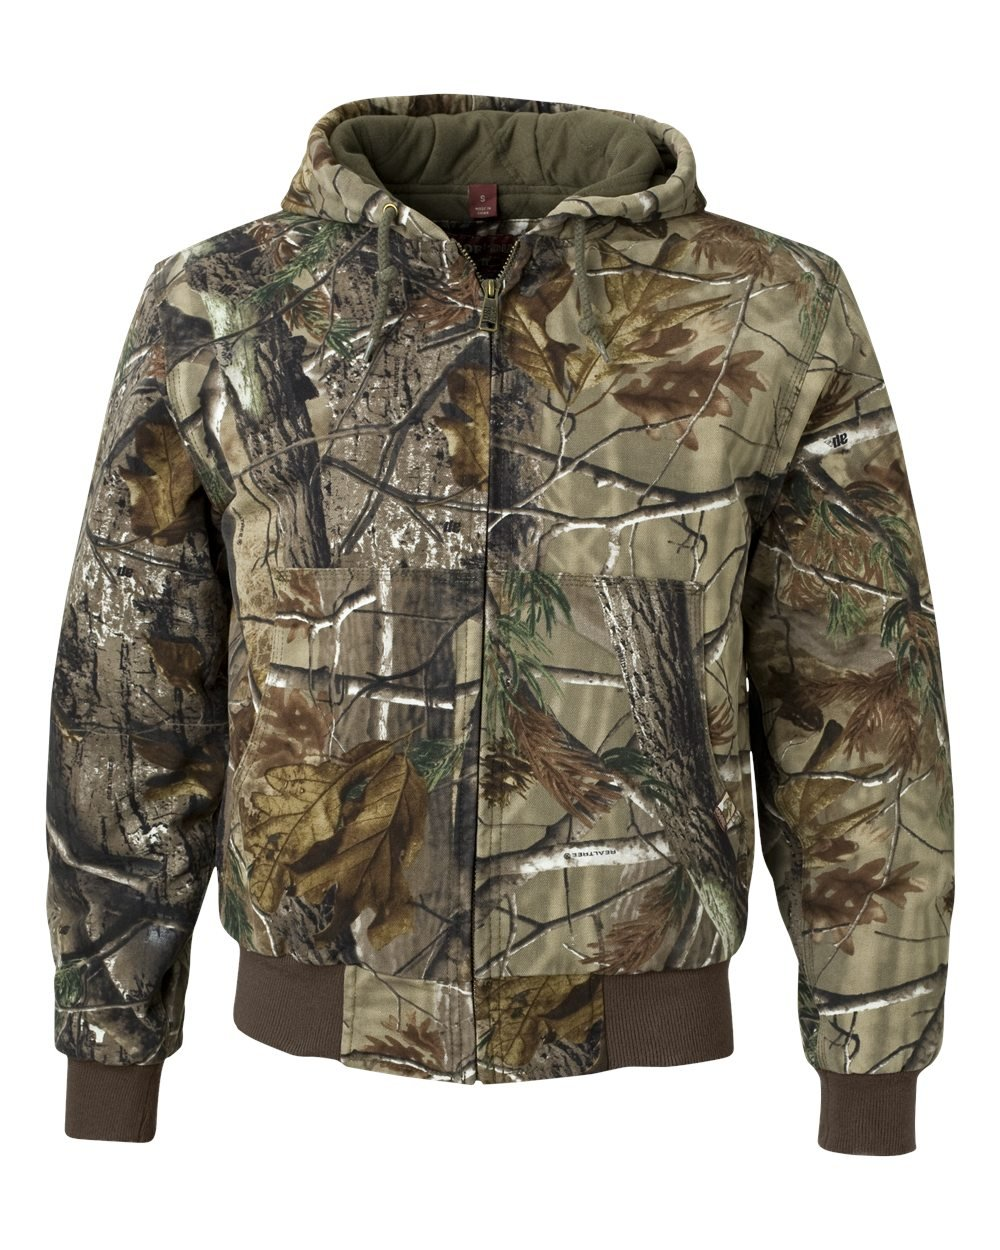 Dri-Duck Men's 5020 Cheyenne Hooded Work Jacket, Realtree Xtra, 5X-Large